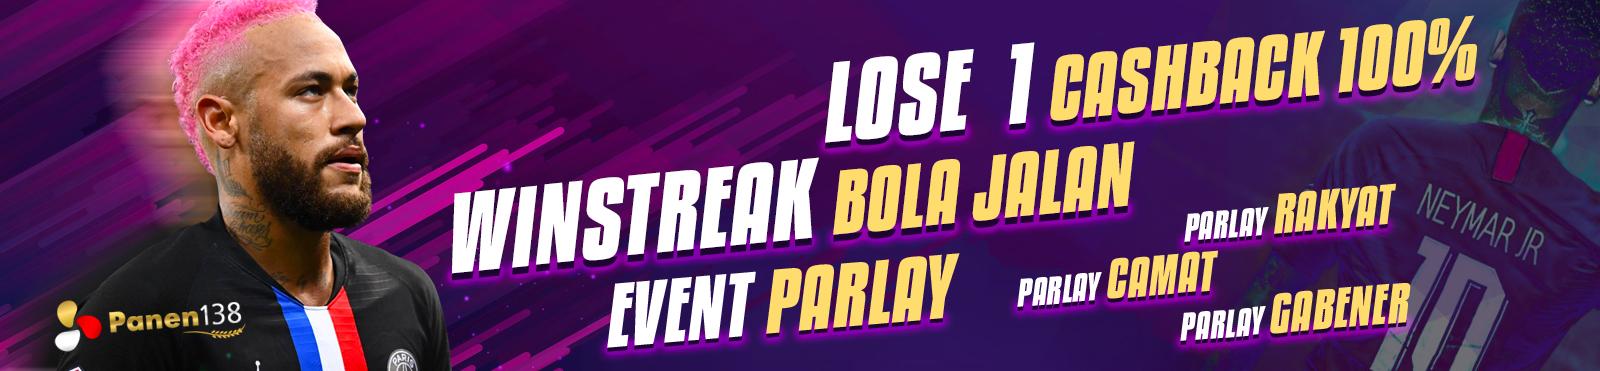 Event Bonus MixParlay